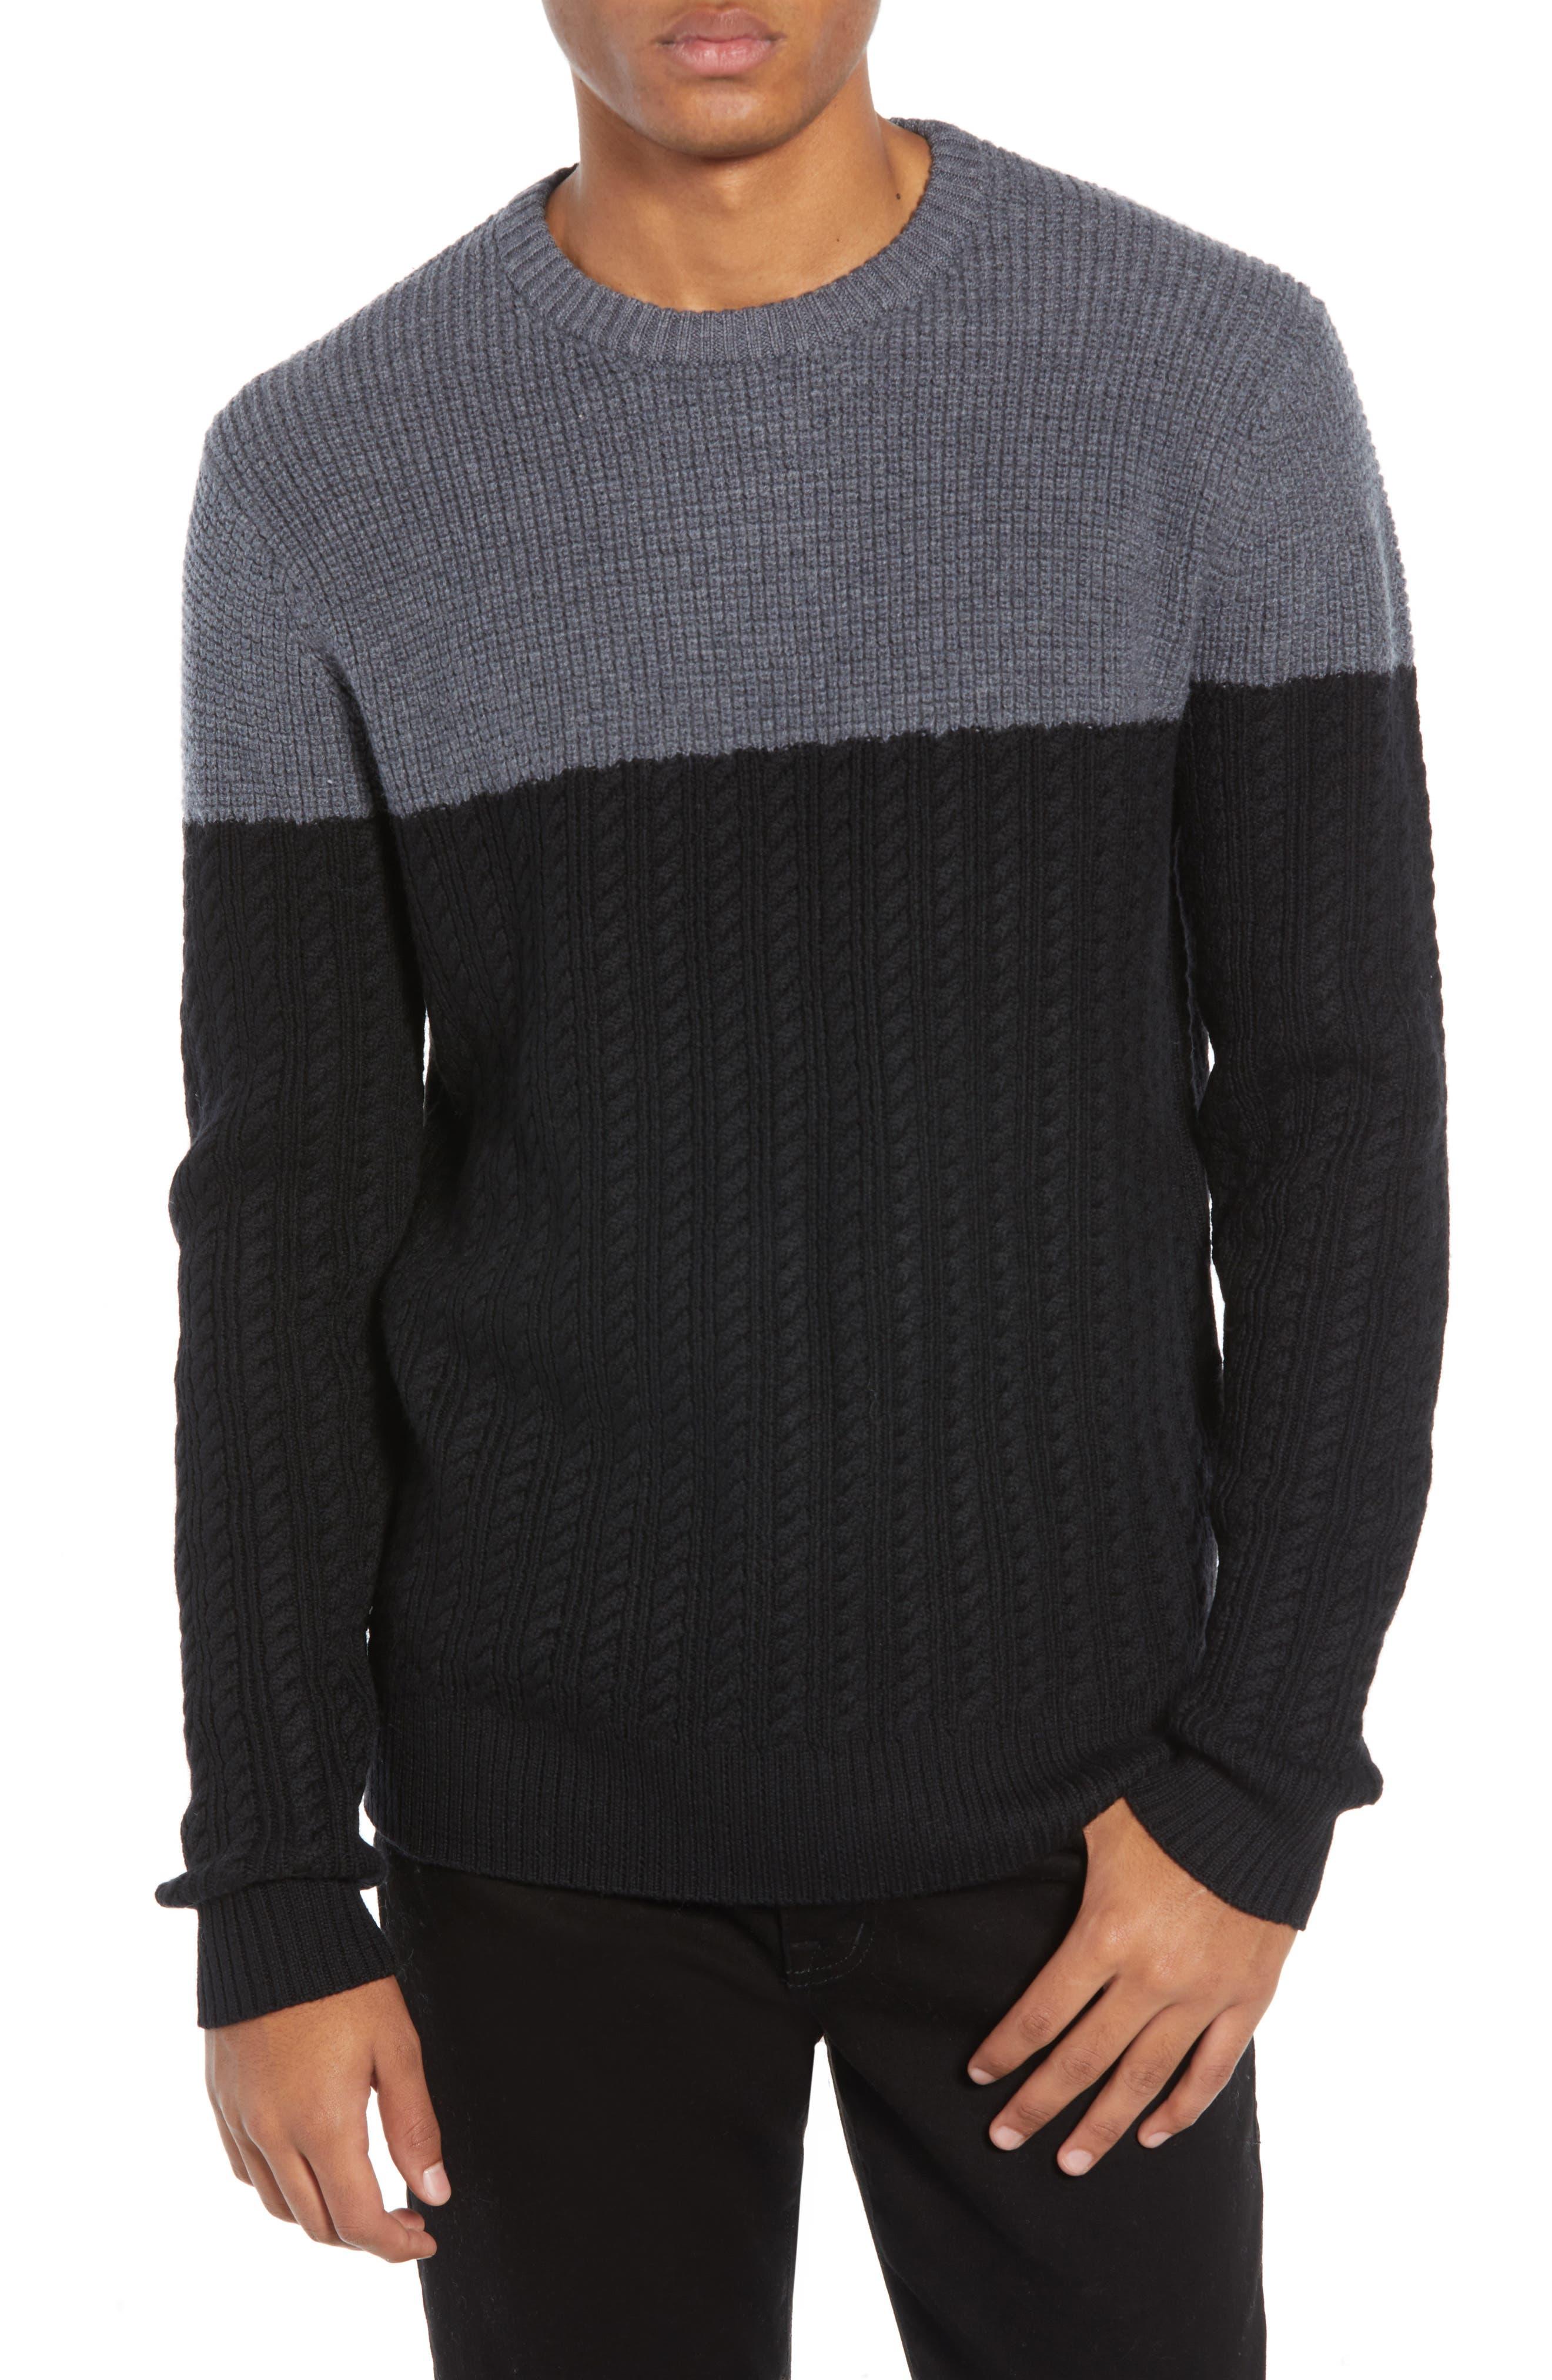 Block Merino Wool Cable Knit Sweater,                             Main thumbnail 1, color,                             BLACK CAVIAR COLORBLOCK